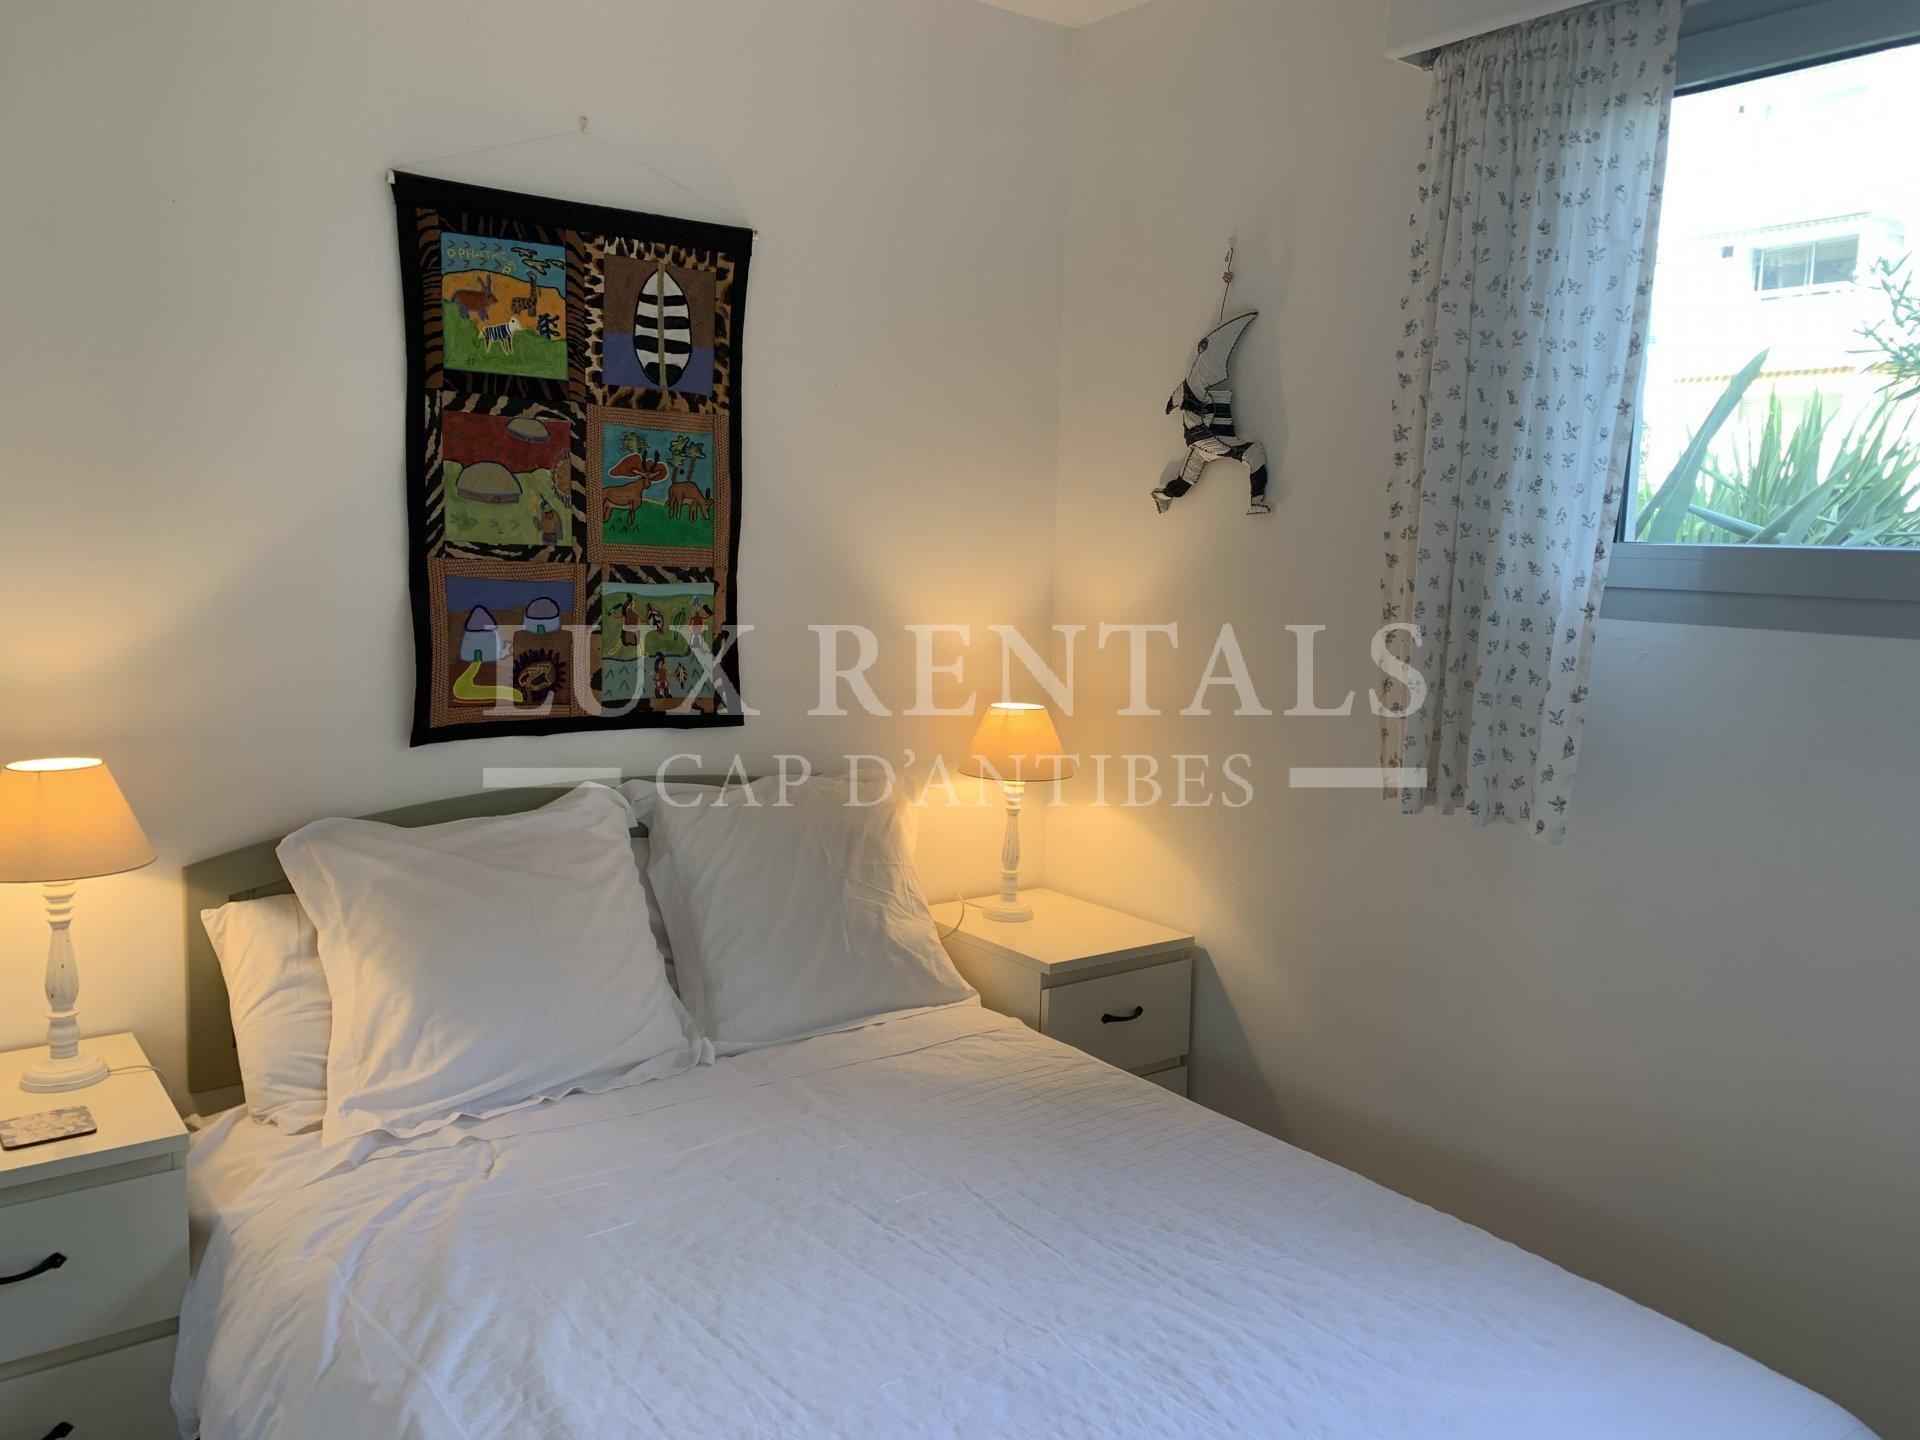 Seasonal rental Apartment - Cap d'Antibes